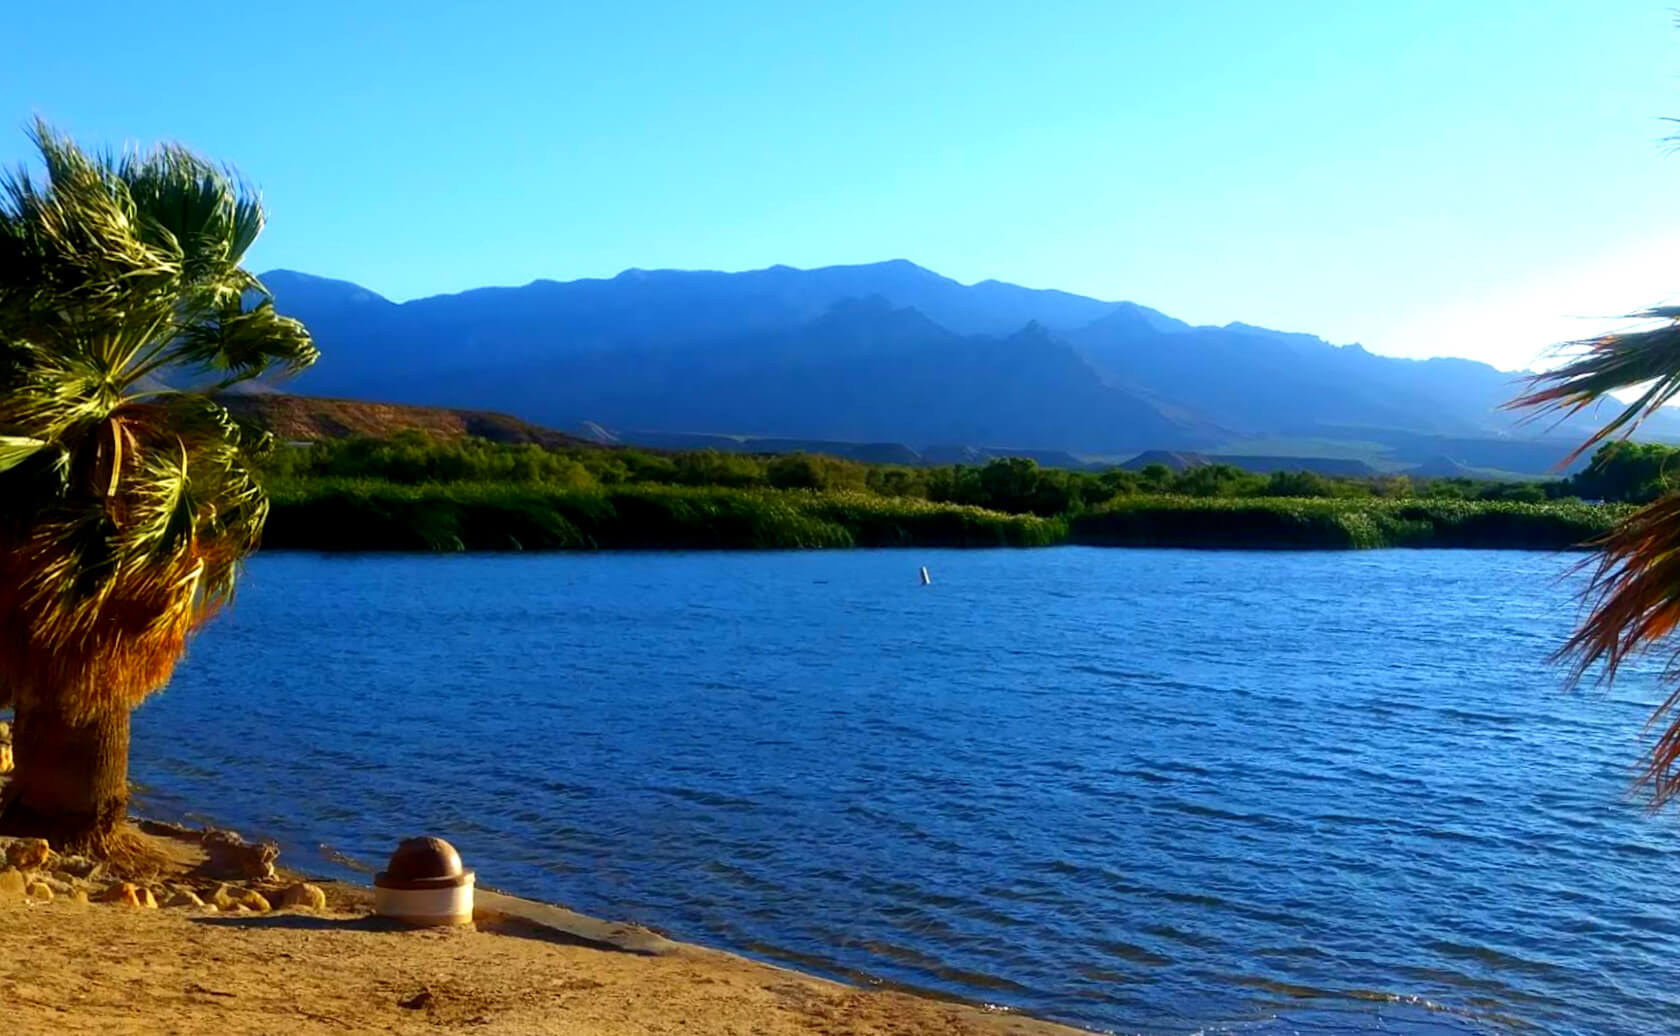 Roper-Lake-Fishing-Guide-Report-Safford-AZ-05